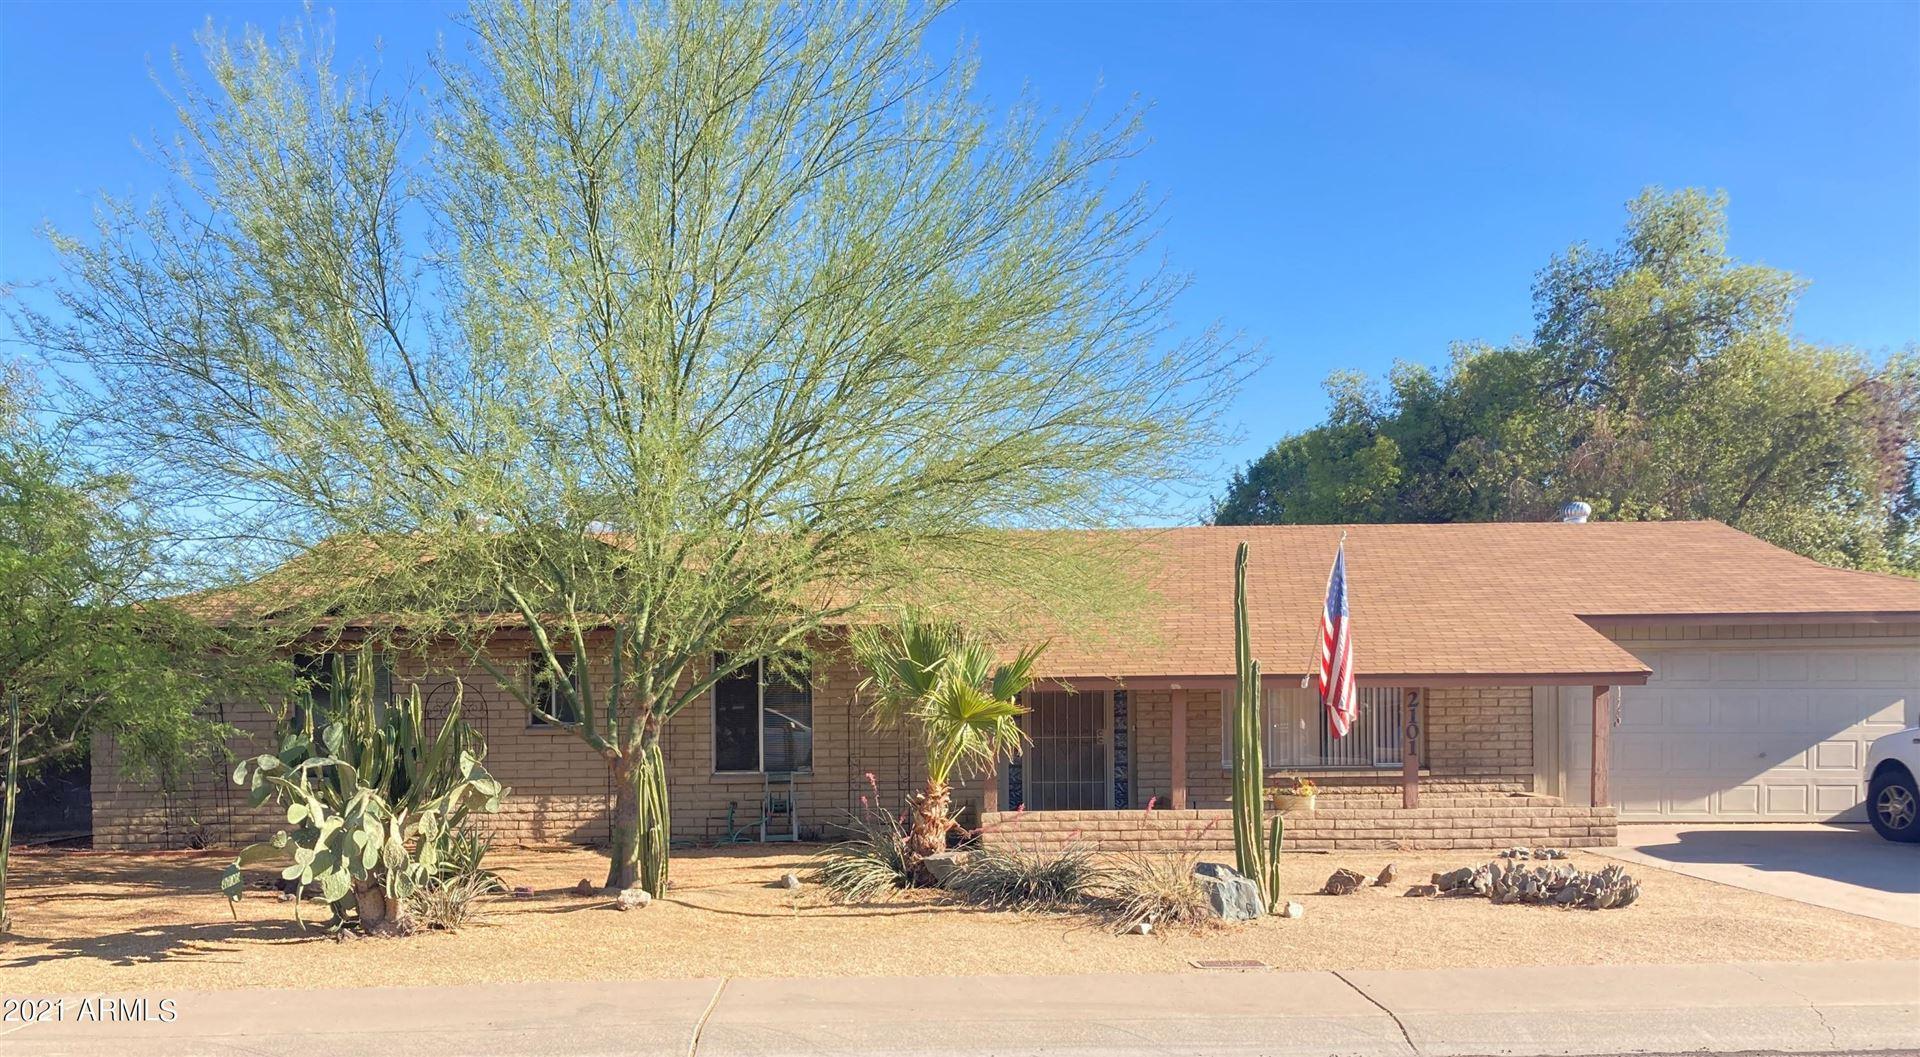 Photo of 2101 W JULIE Circle, Phoenix, AZ 85027 (MLS # 6242894)